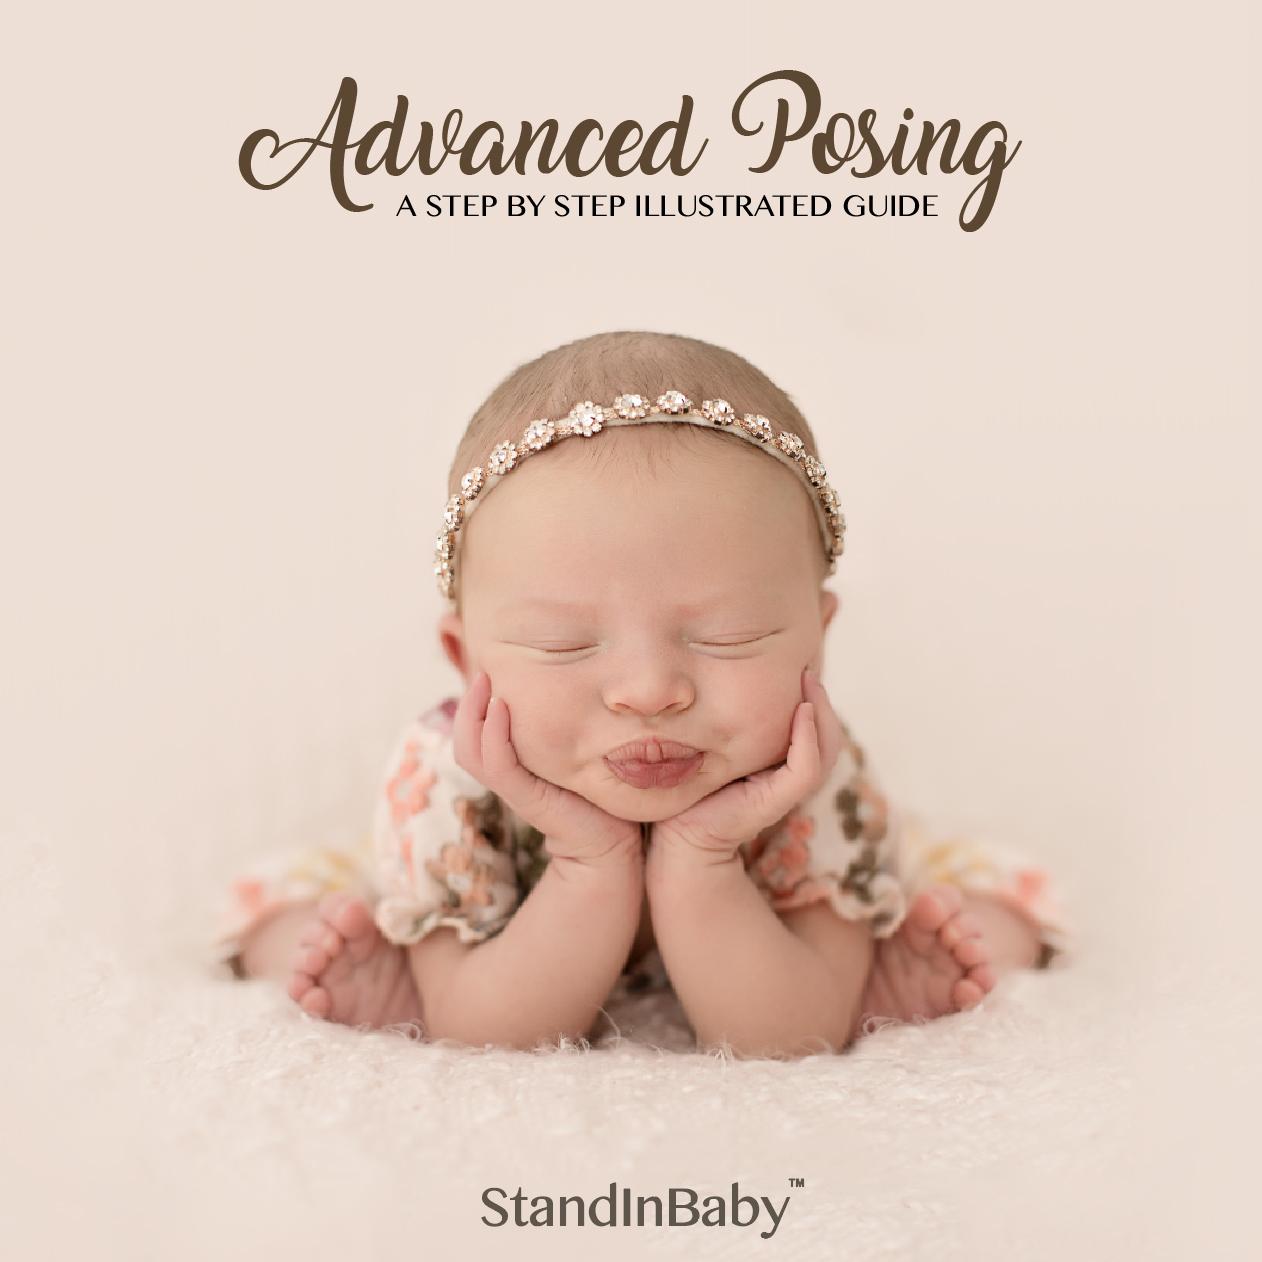 AdvancedPosing_StandInBaby